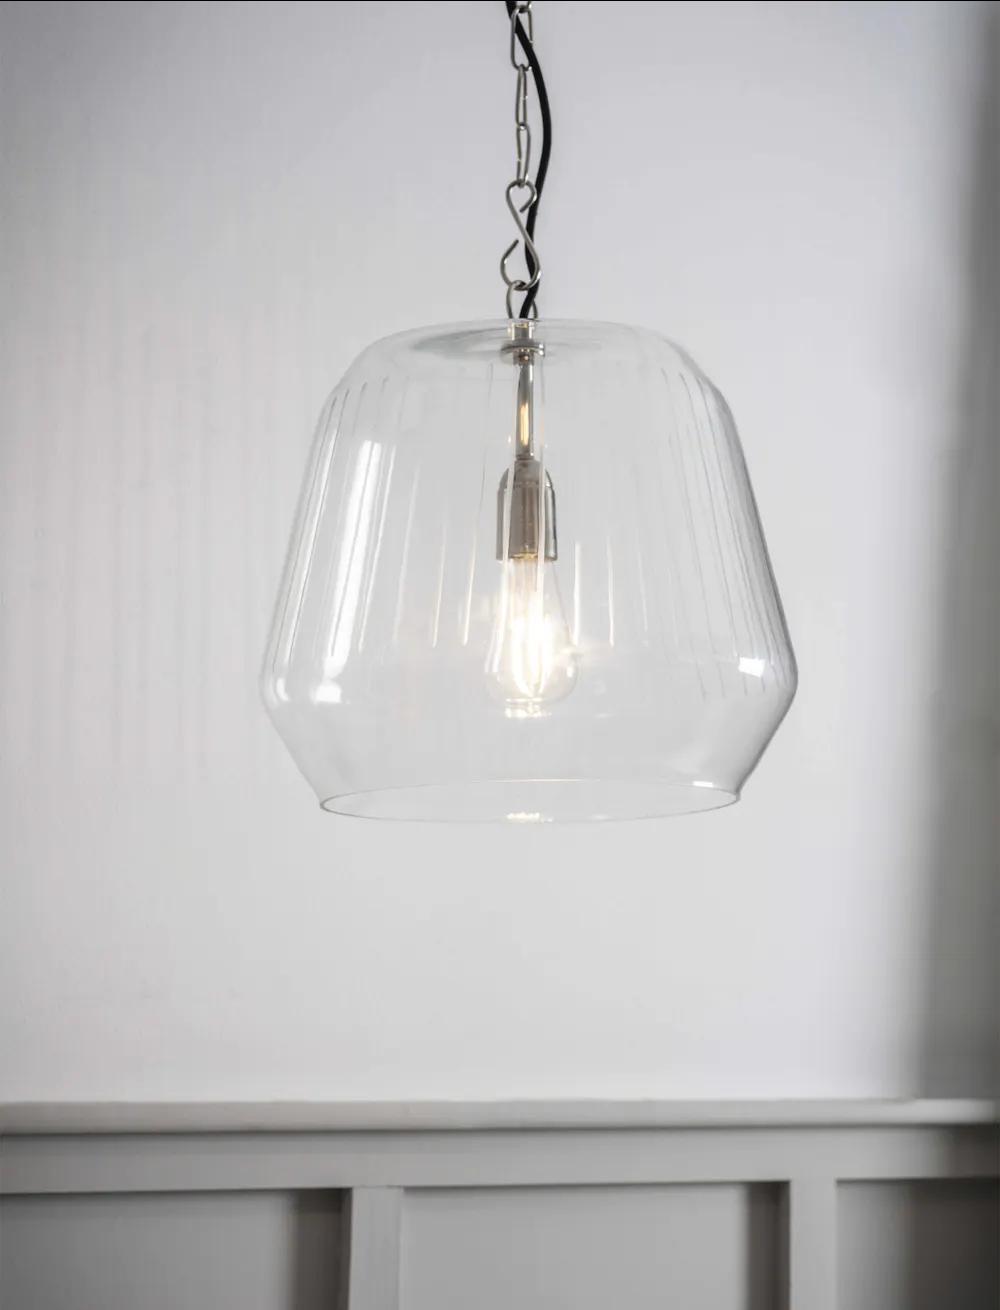 Gosforth Pendant Light Pendant Light Bathroom Pendant Lighting Indoor Pendant